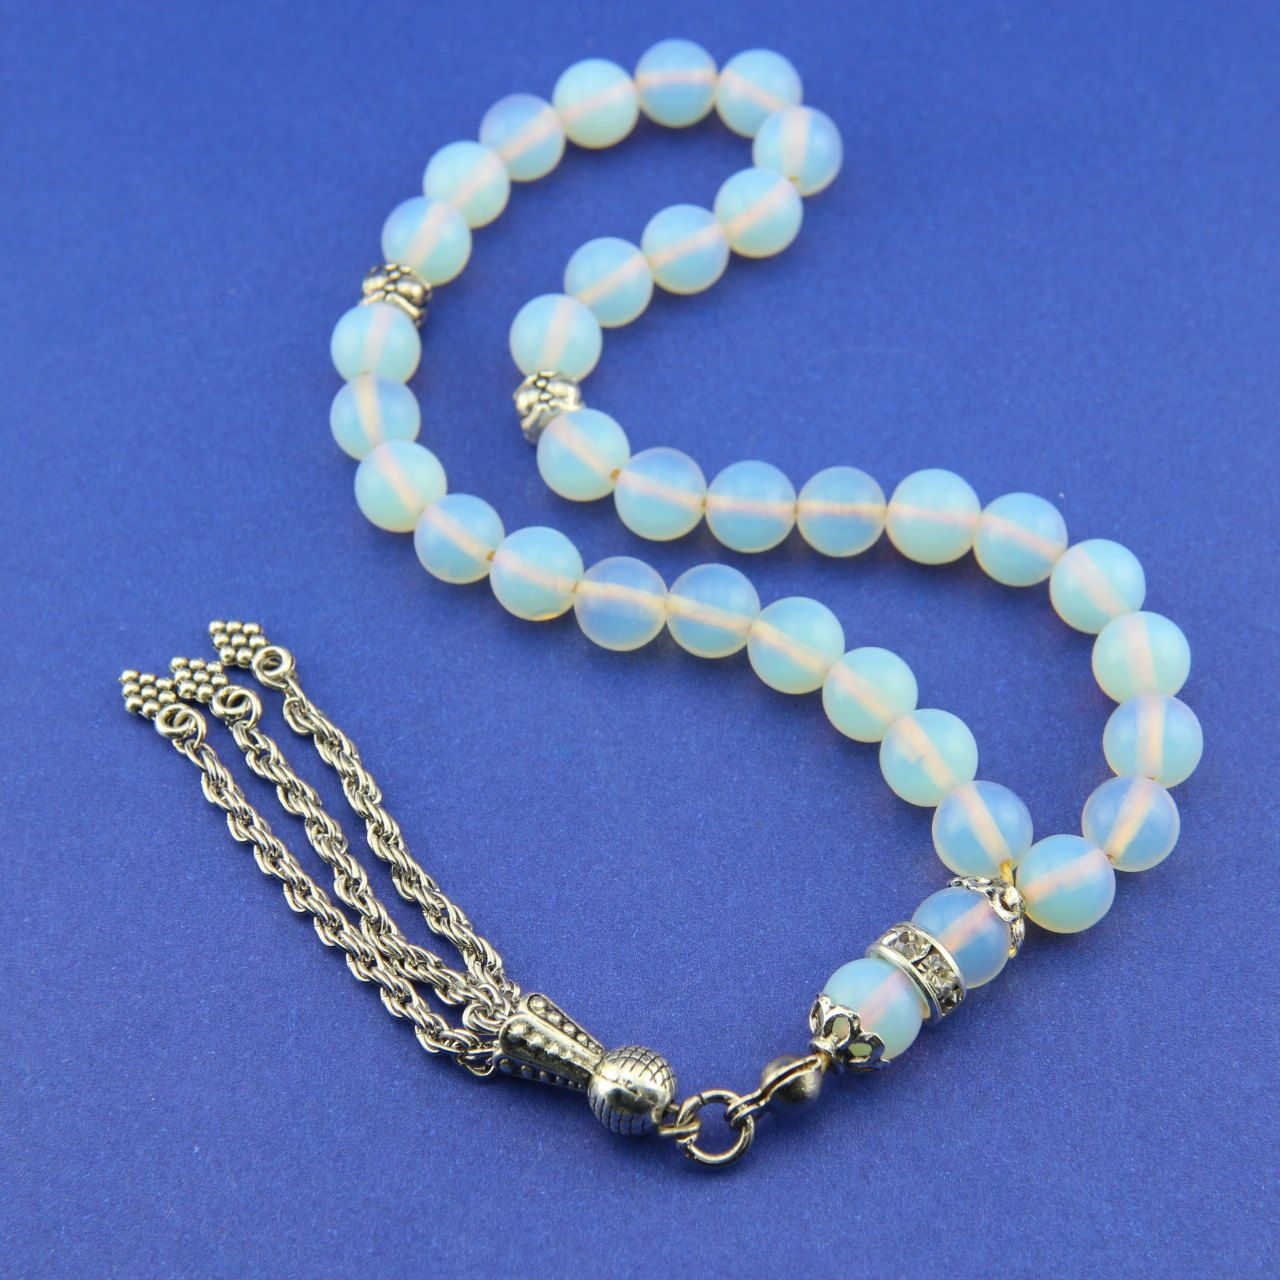 Opal gemstone 33pcs Islamic Prayer Beads Misbaha Tesbih from Turkey 165806 by Tesbih on Etsy